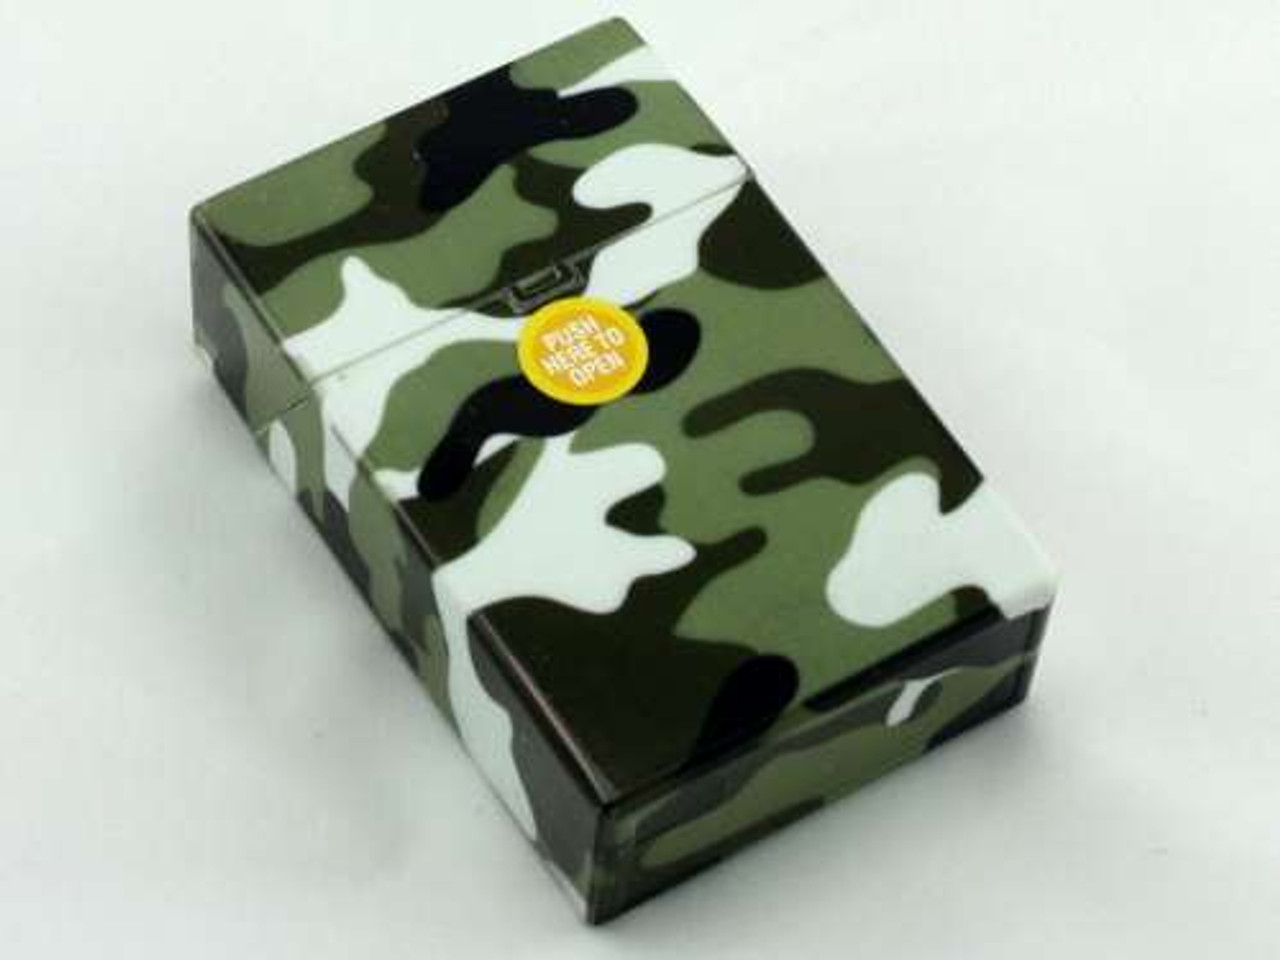 Arctic Camouflage Cigarette Pack Holder